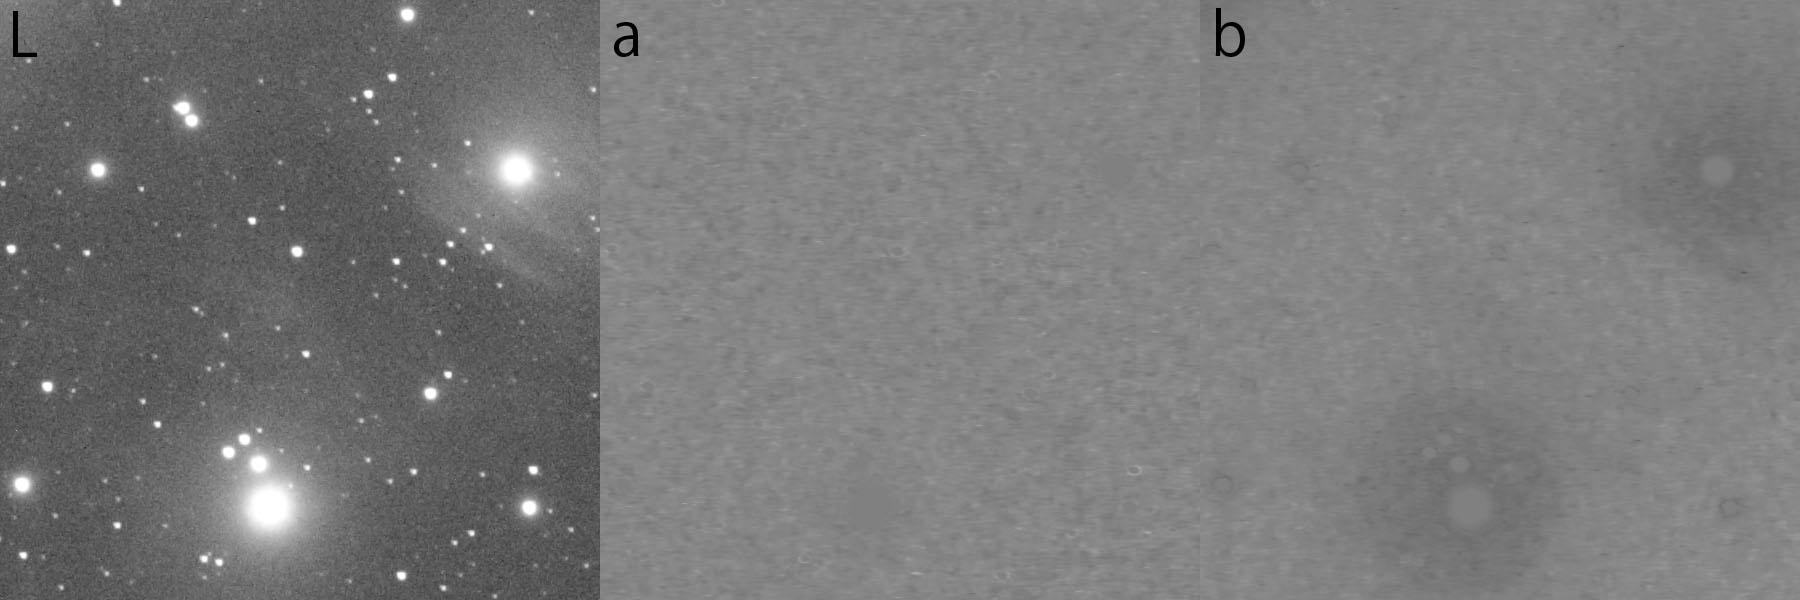 a5bd6b87.jpg